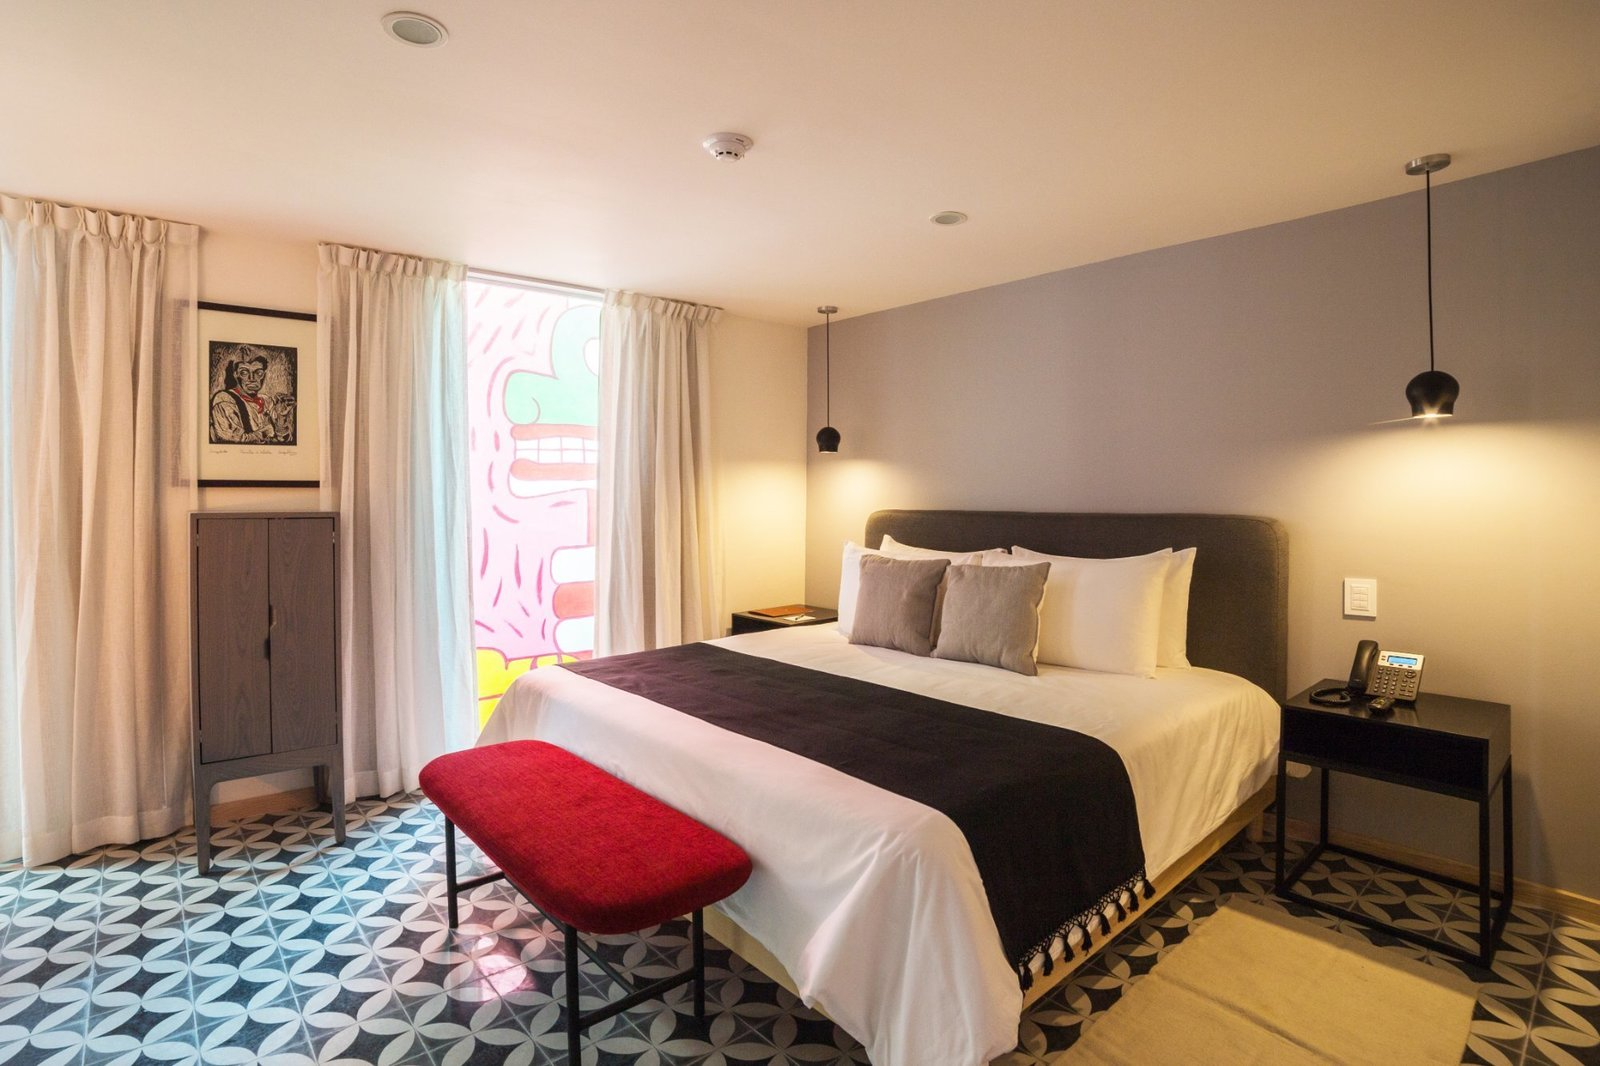 Bedroom, Night Stands, Bench, Recessed Lighting, Ceramic Tile Floor, Bed, and Storage  Hotel Morgana